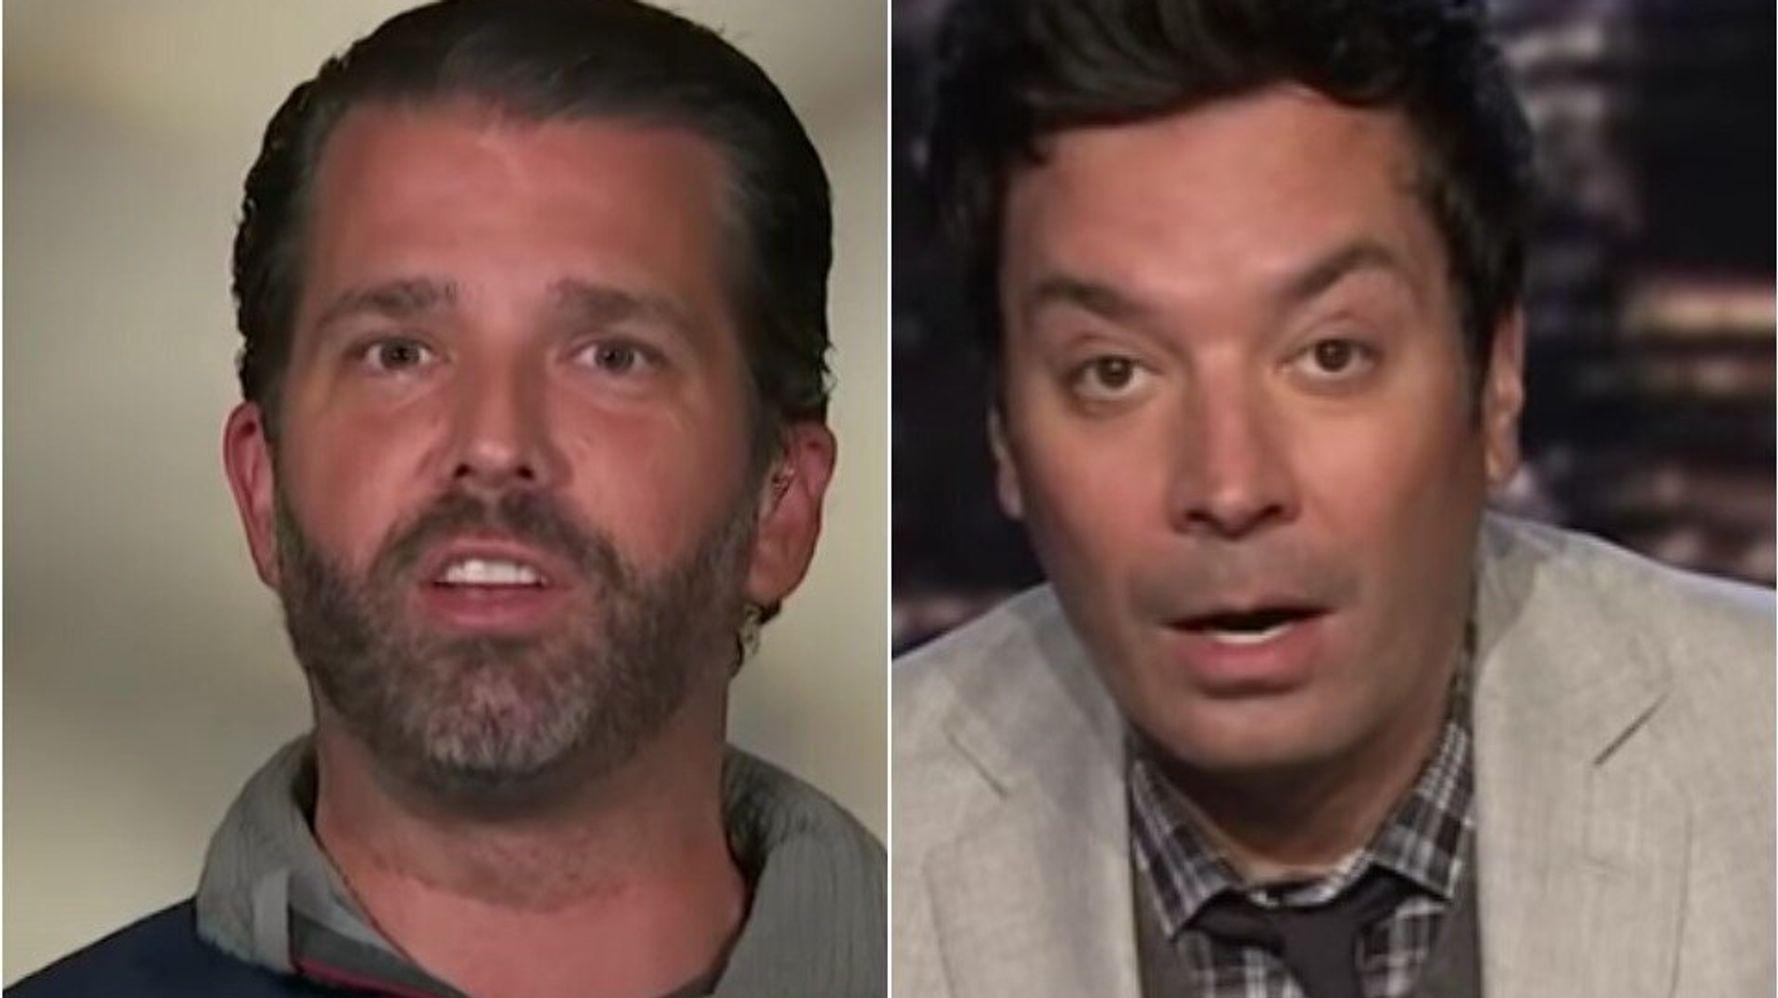 Donald Trump Jr.'s 'Pumped' Fox News Interview Gets The Treatment From Jimmy Fallon